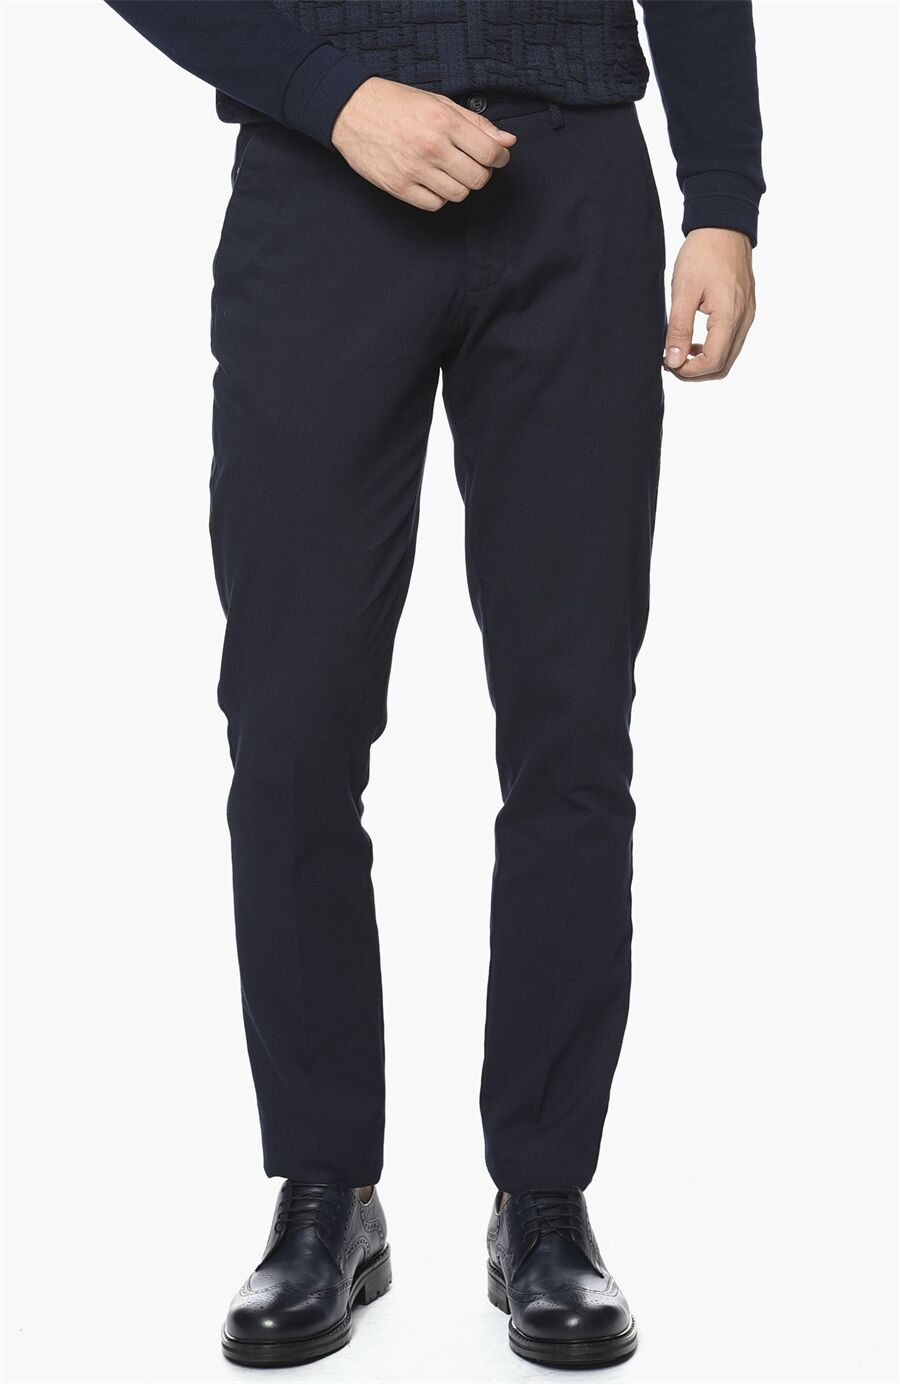 Armürlü Desen Lacivert Pantolon